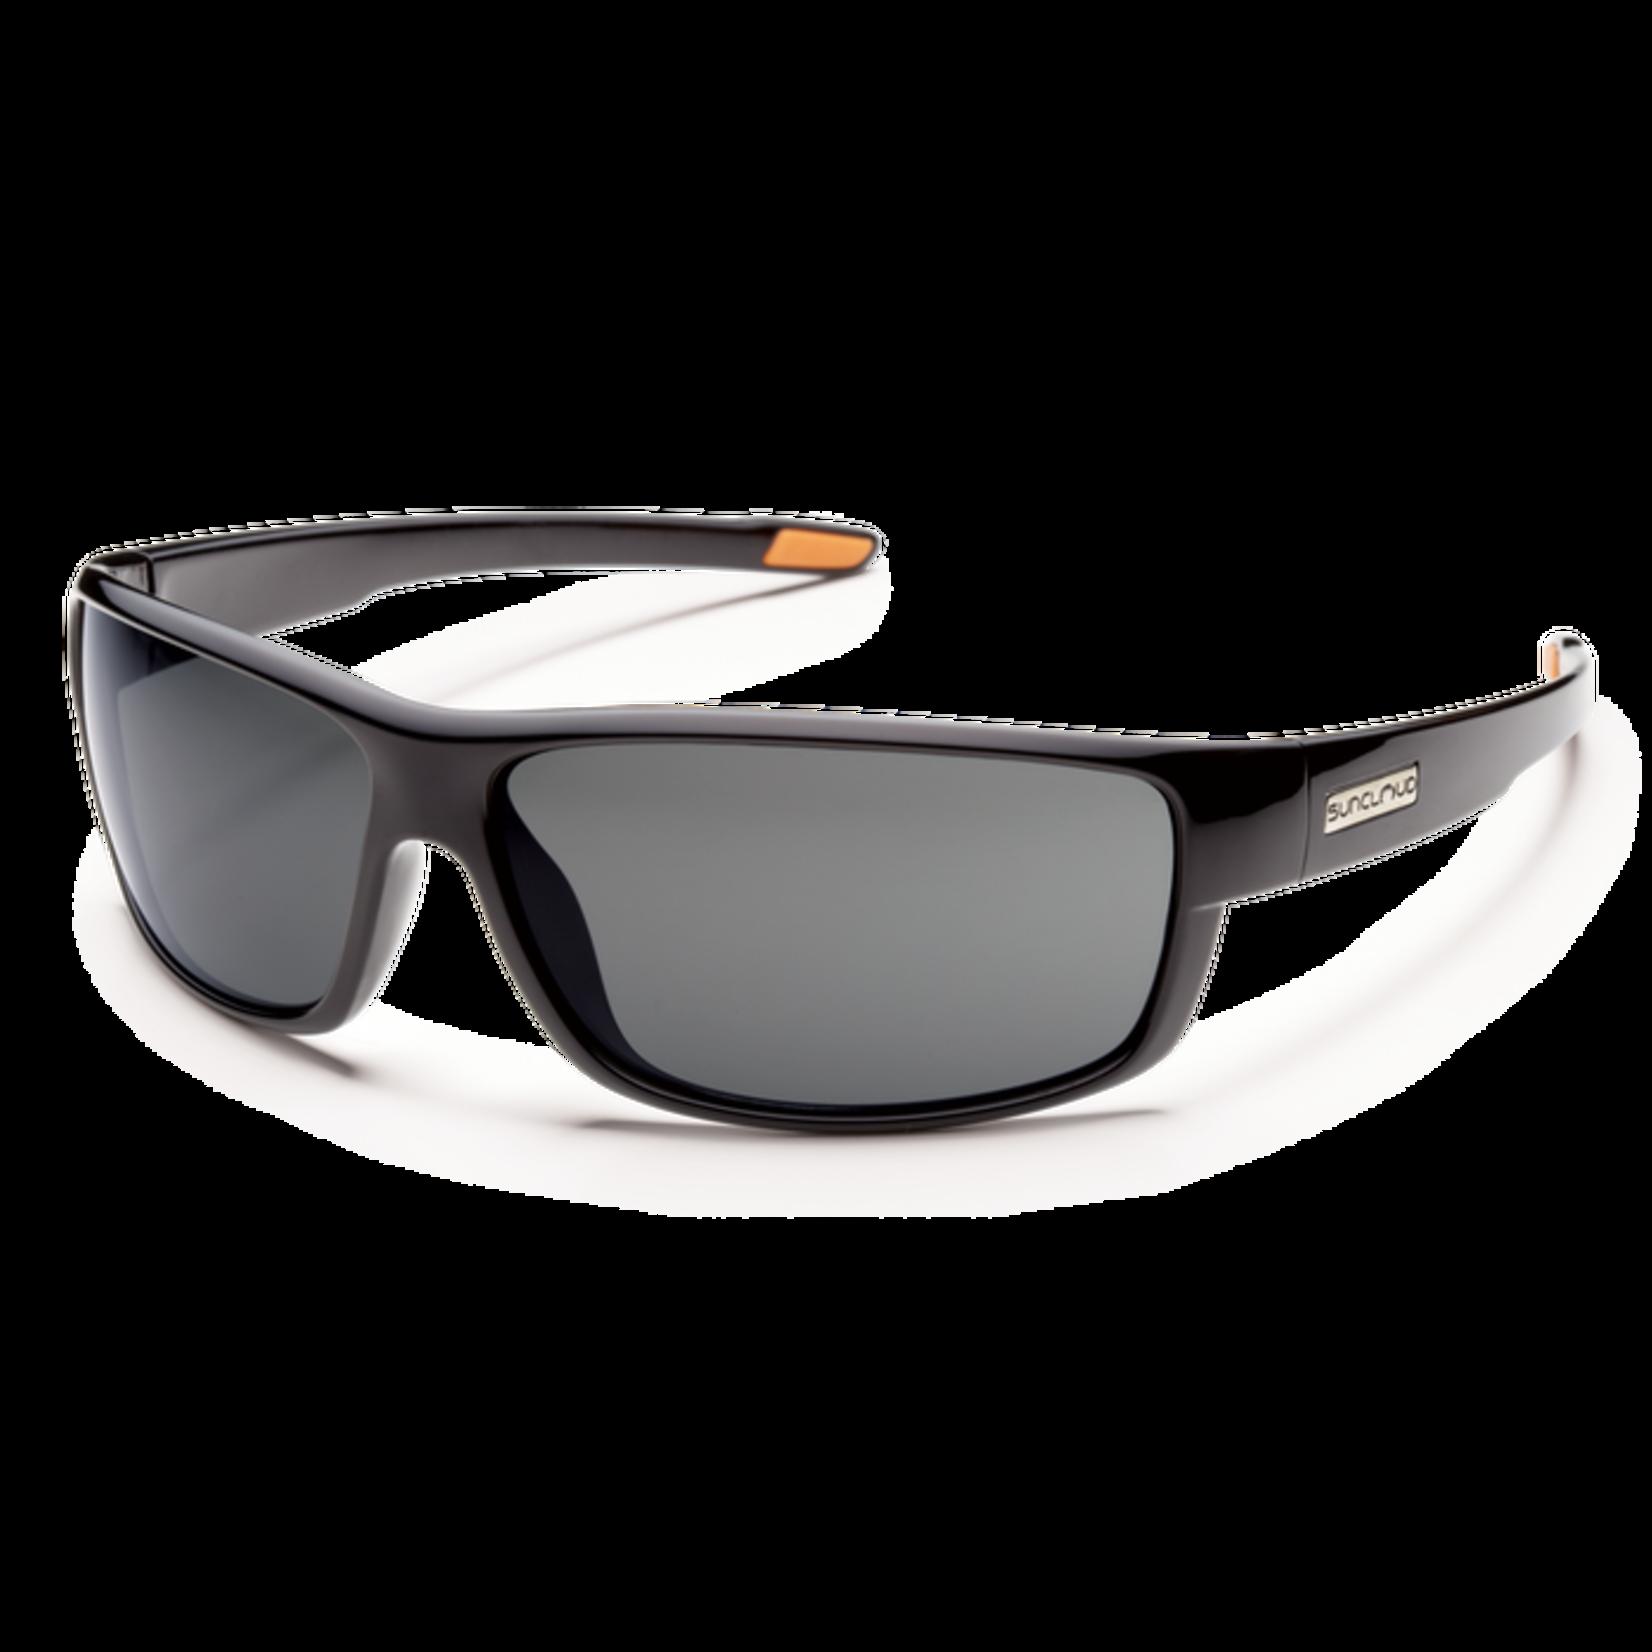 Suncloud Optics Suncloud Voucher Polarized Sunglasses